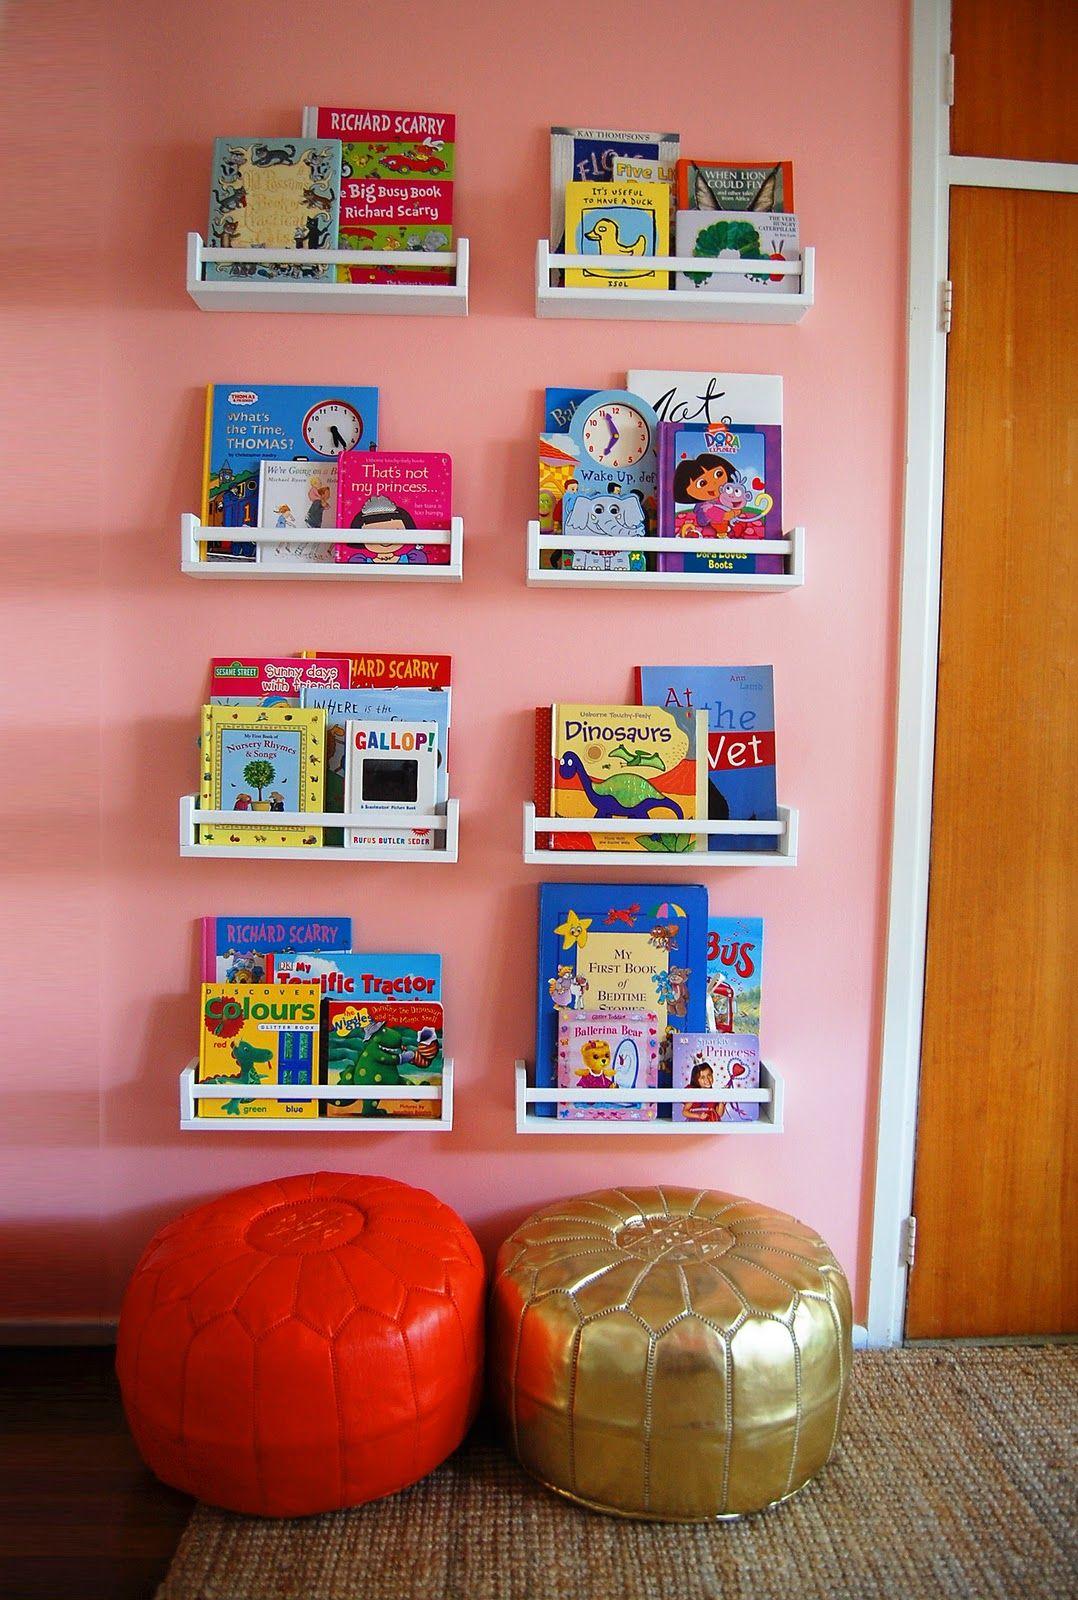 ikea spice racks as book shelves kids stuff pinterest. Black Bedroom Furniture Sets. Home Design Ideas